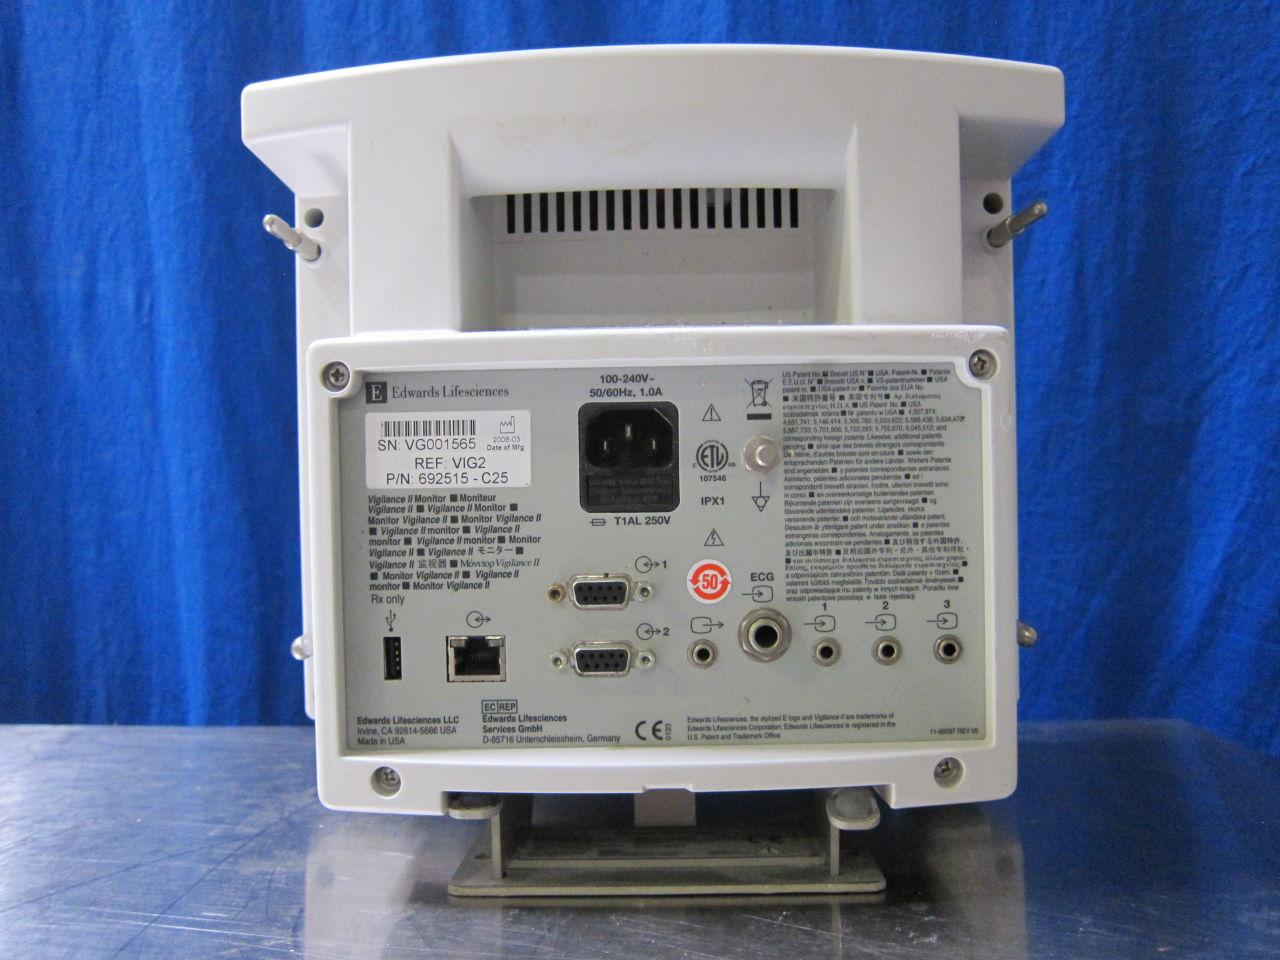 EDWARDS LIFE SCIENCE Vigilance II Monitor